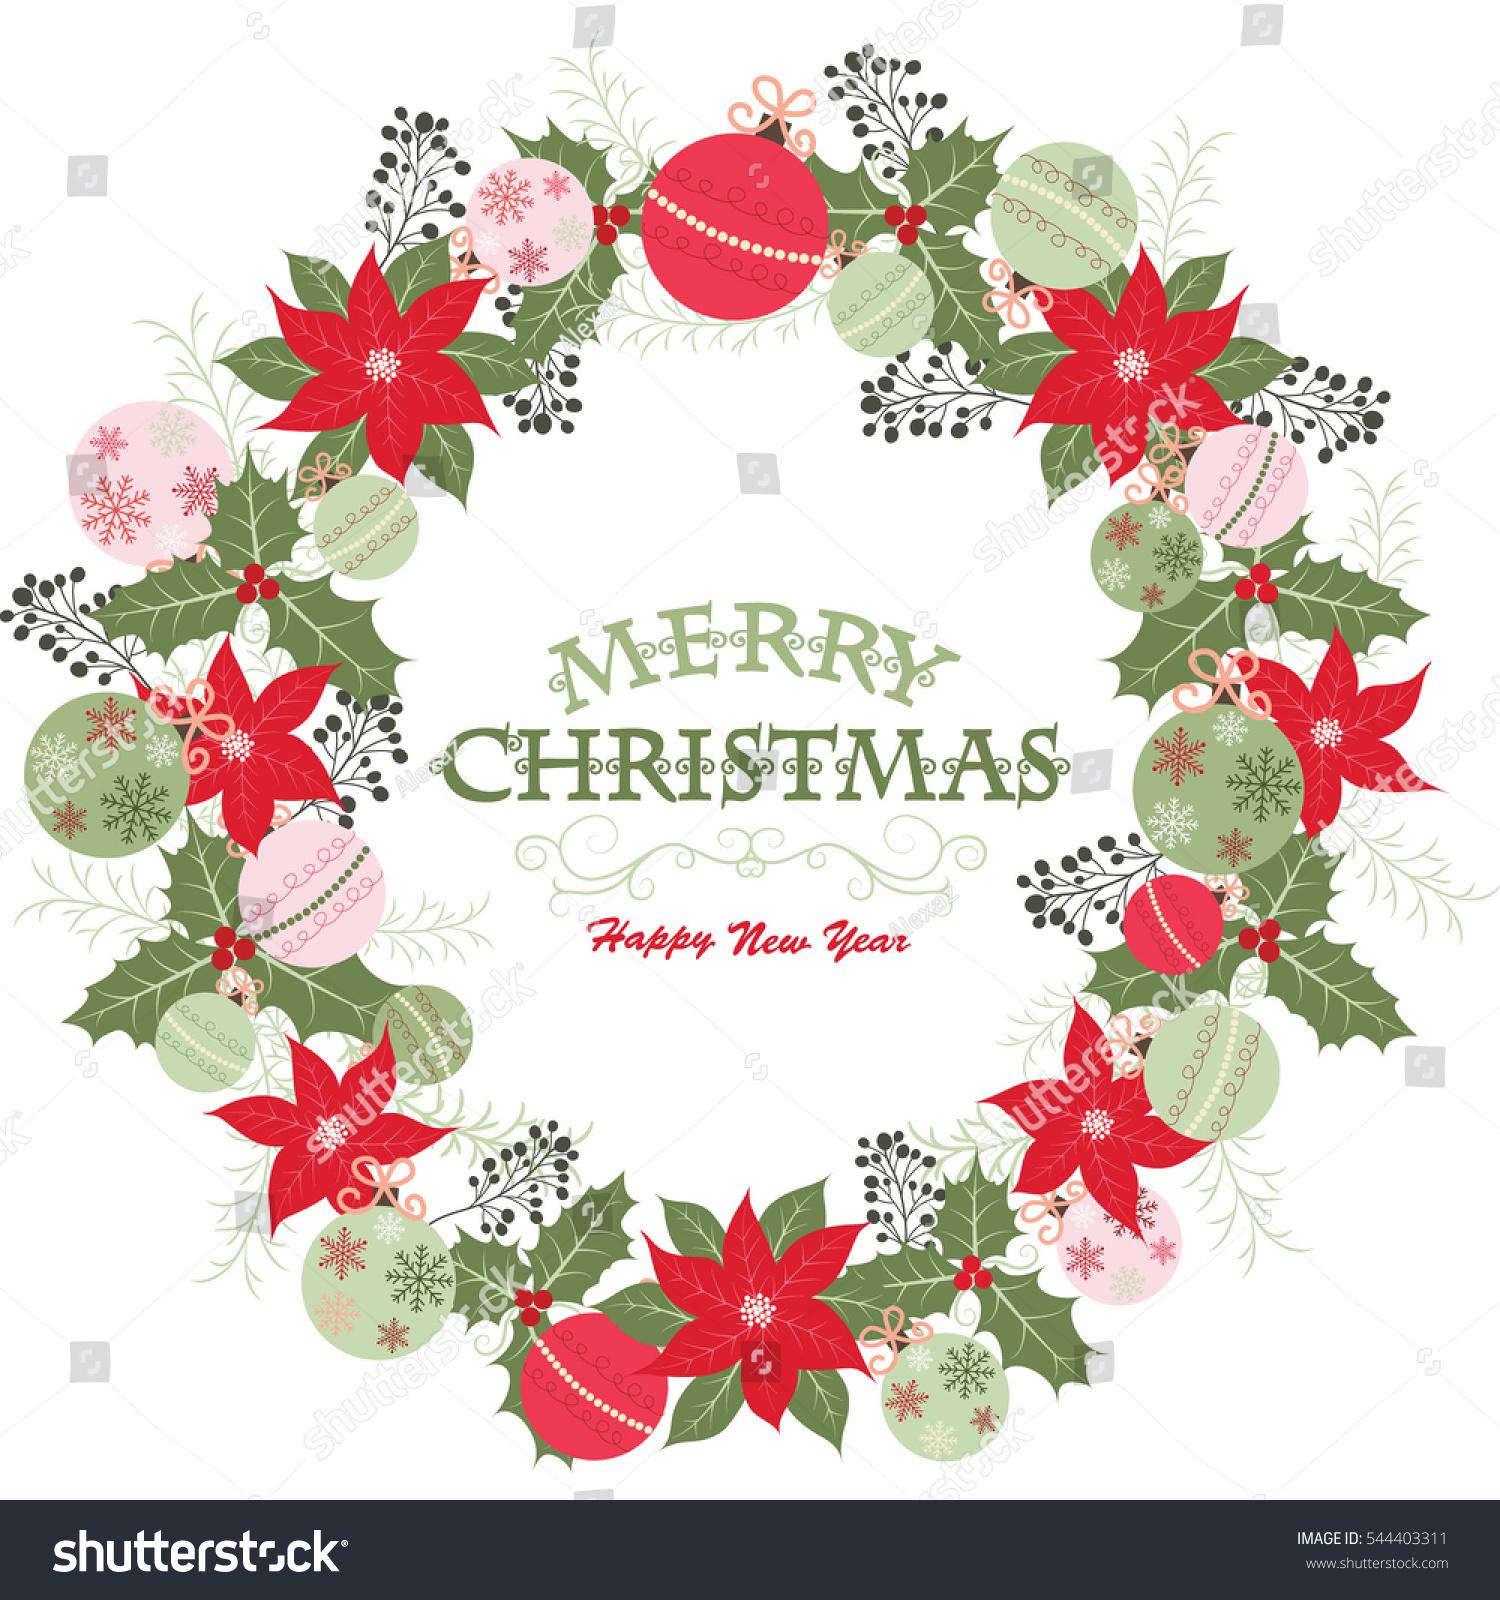 Christmas wreath merry christmas happy new stock vector royalty christmas wreath with merry christmas and happy new yearristmas greeting cardristmas invitation stopboris Choice Image